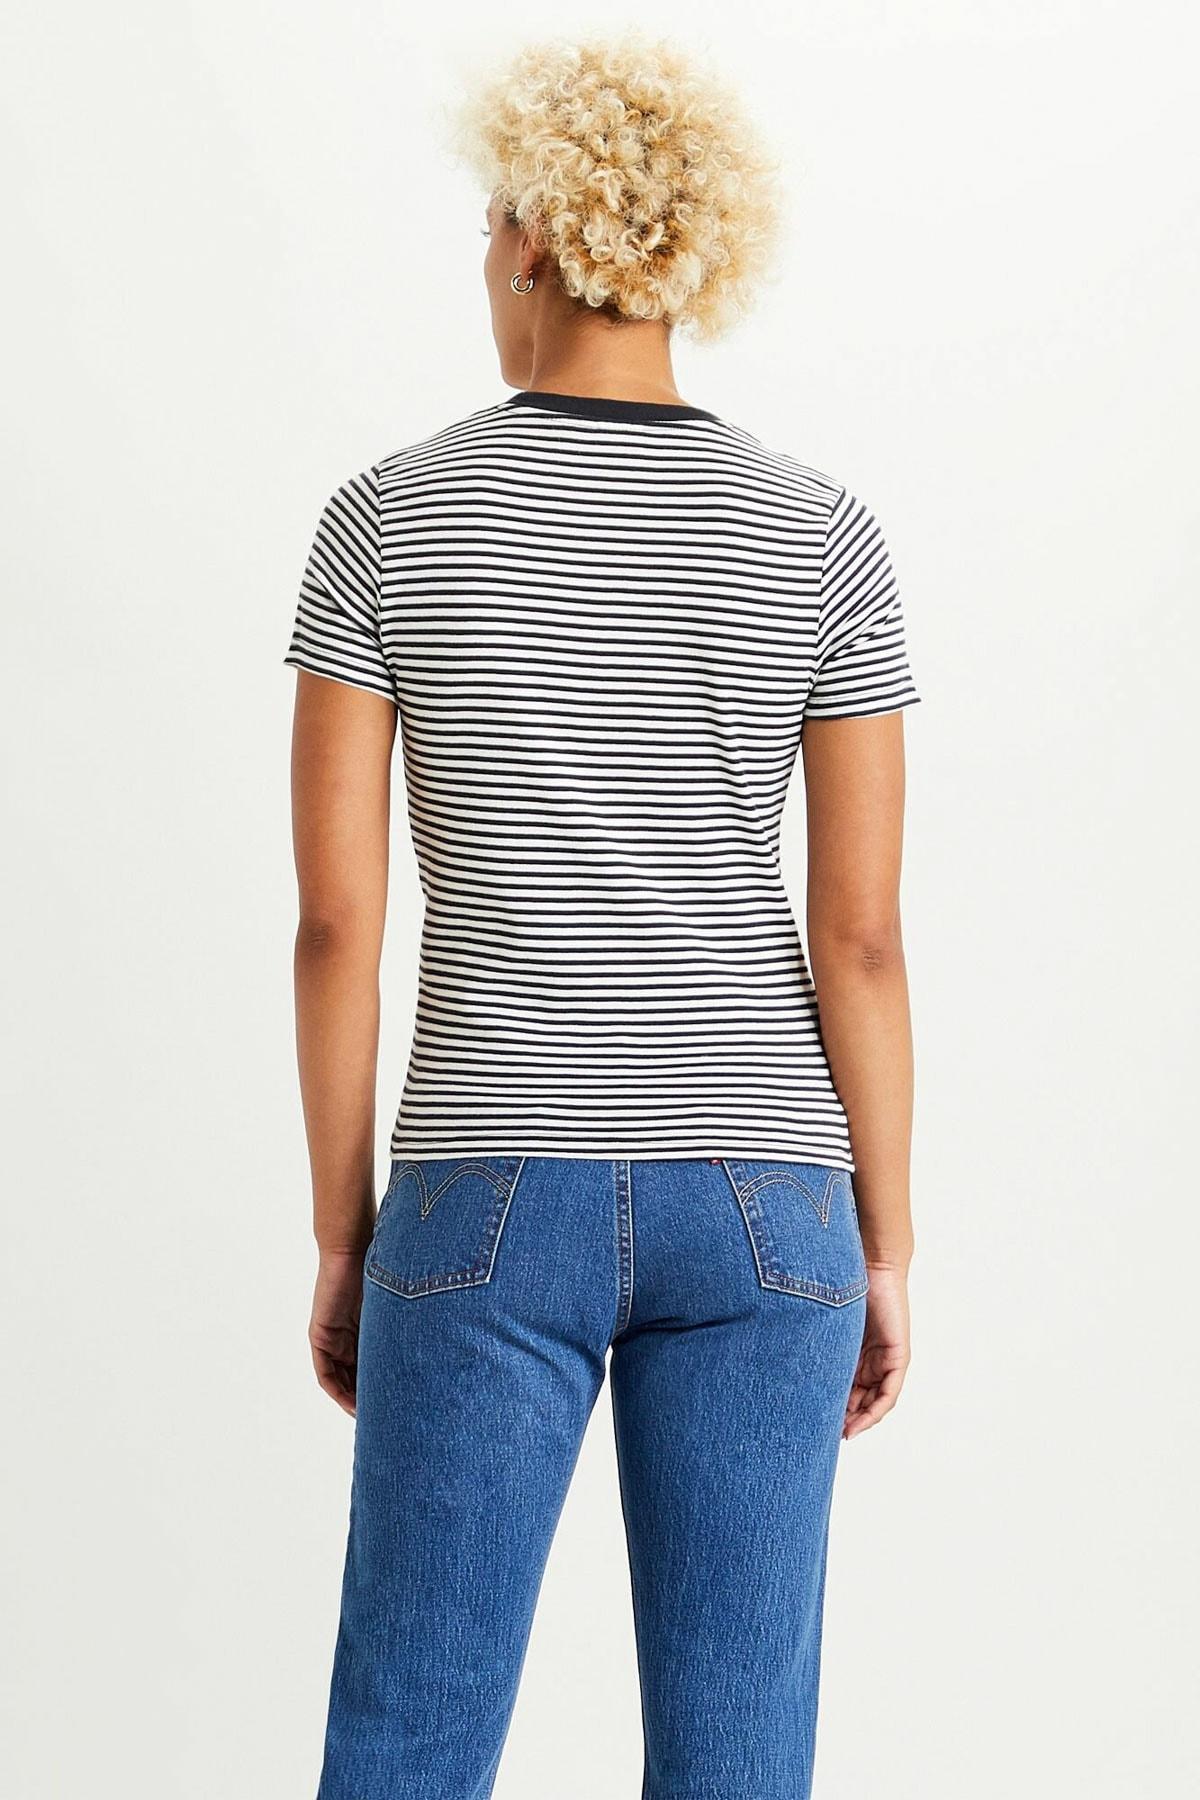 Levi's Kadın T-Shirt 37697-0005 2